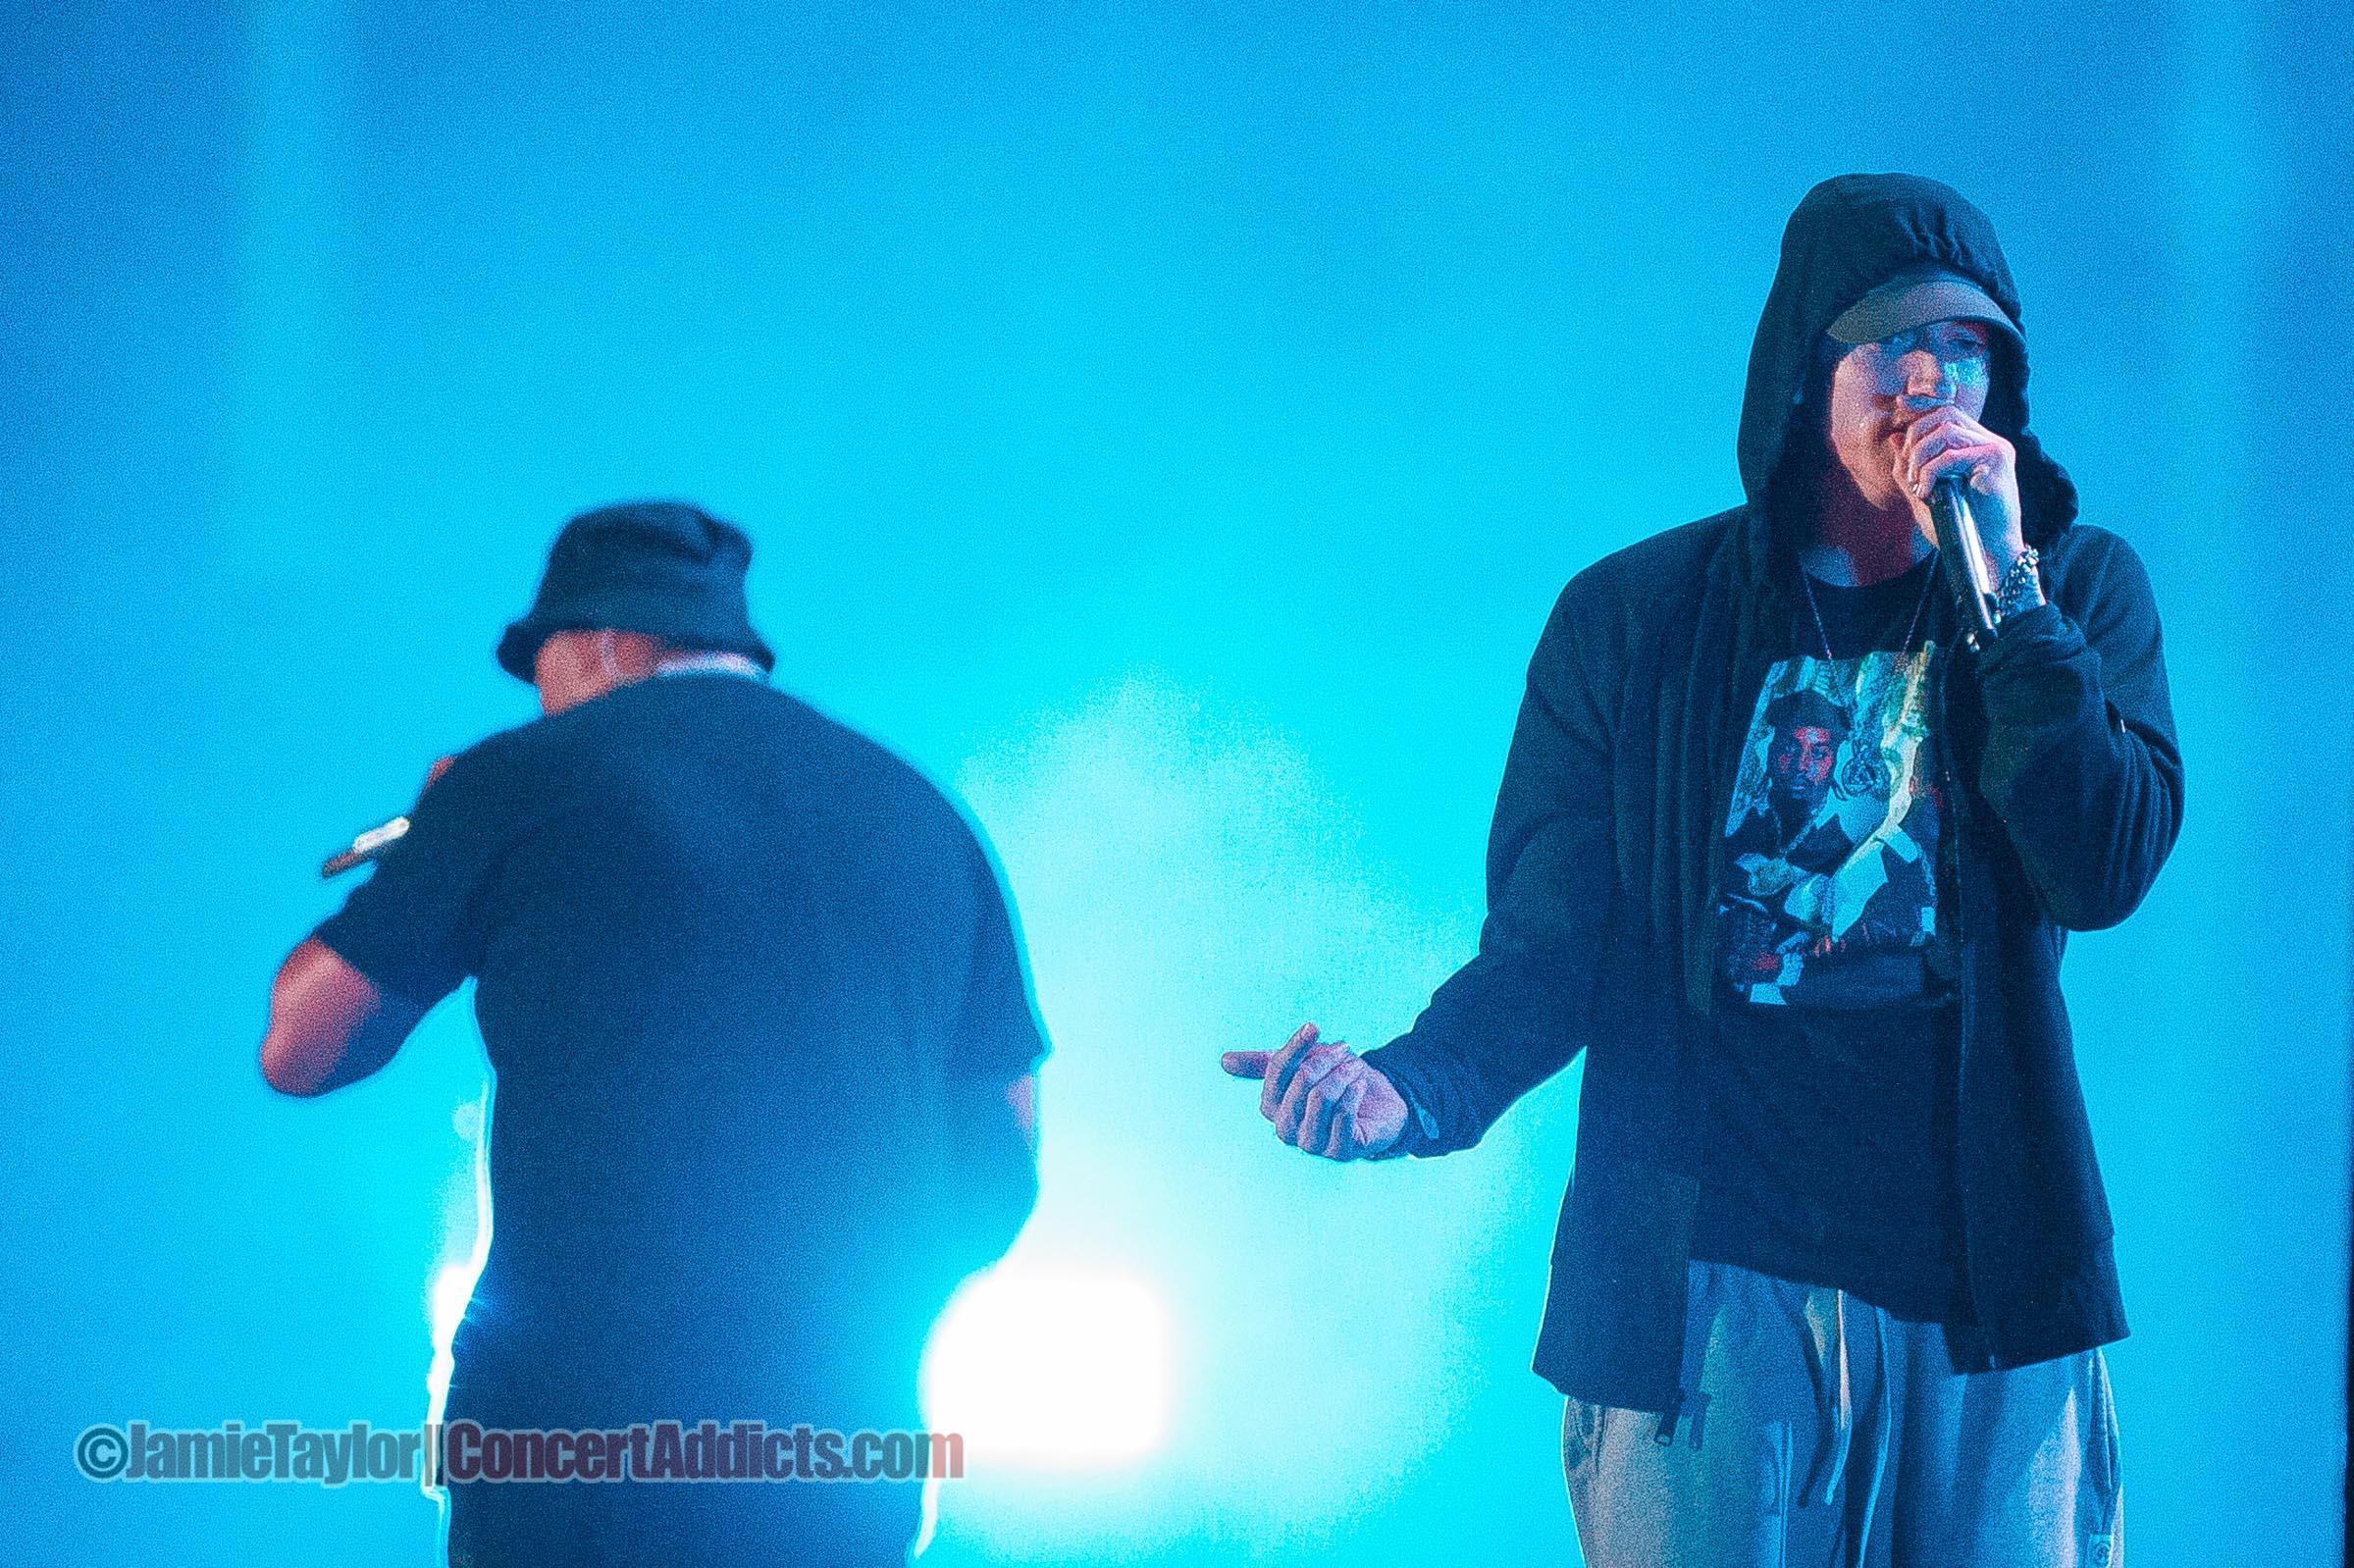 Eminem @ Squamish Valley Music Festival 2014 in Vancouver, Canada